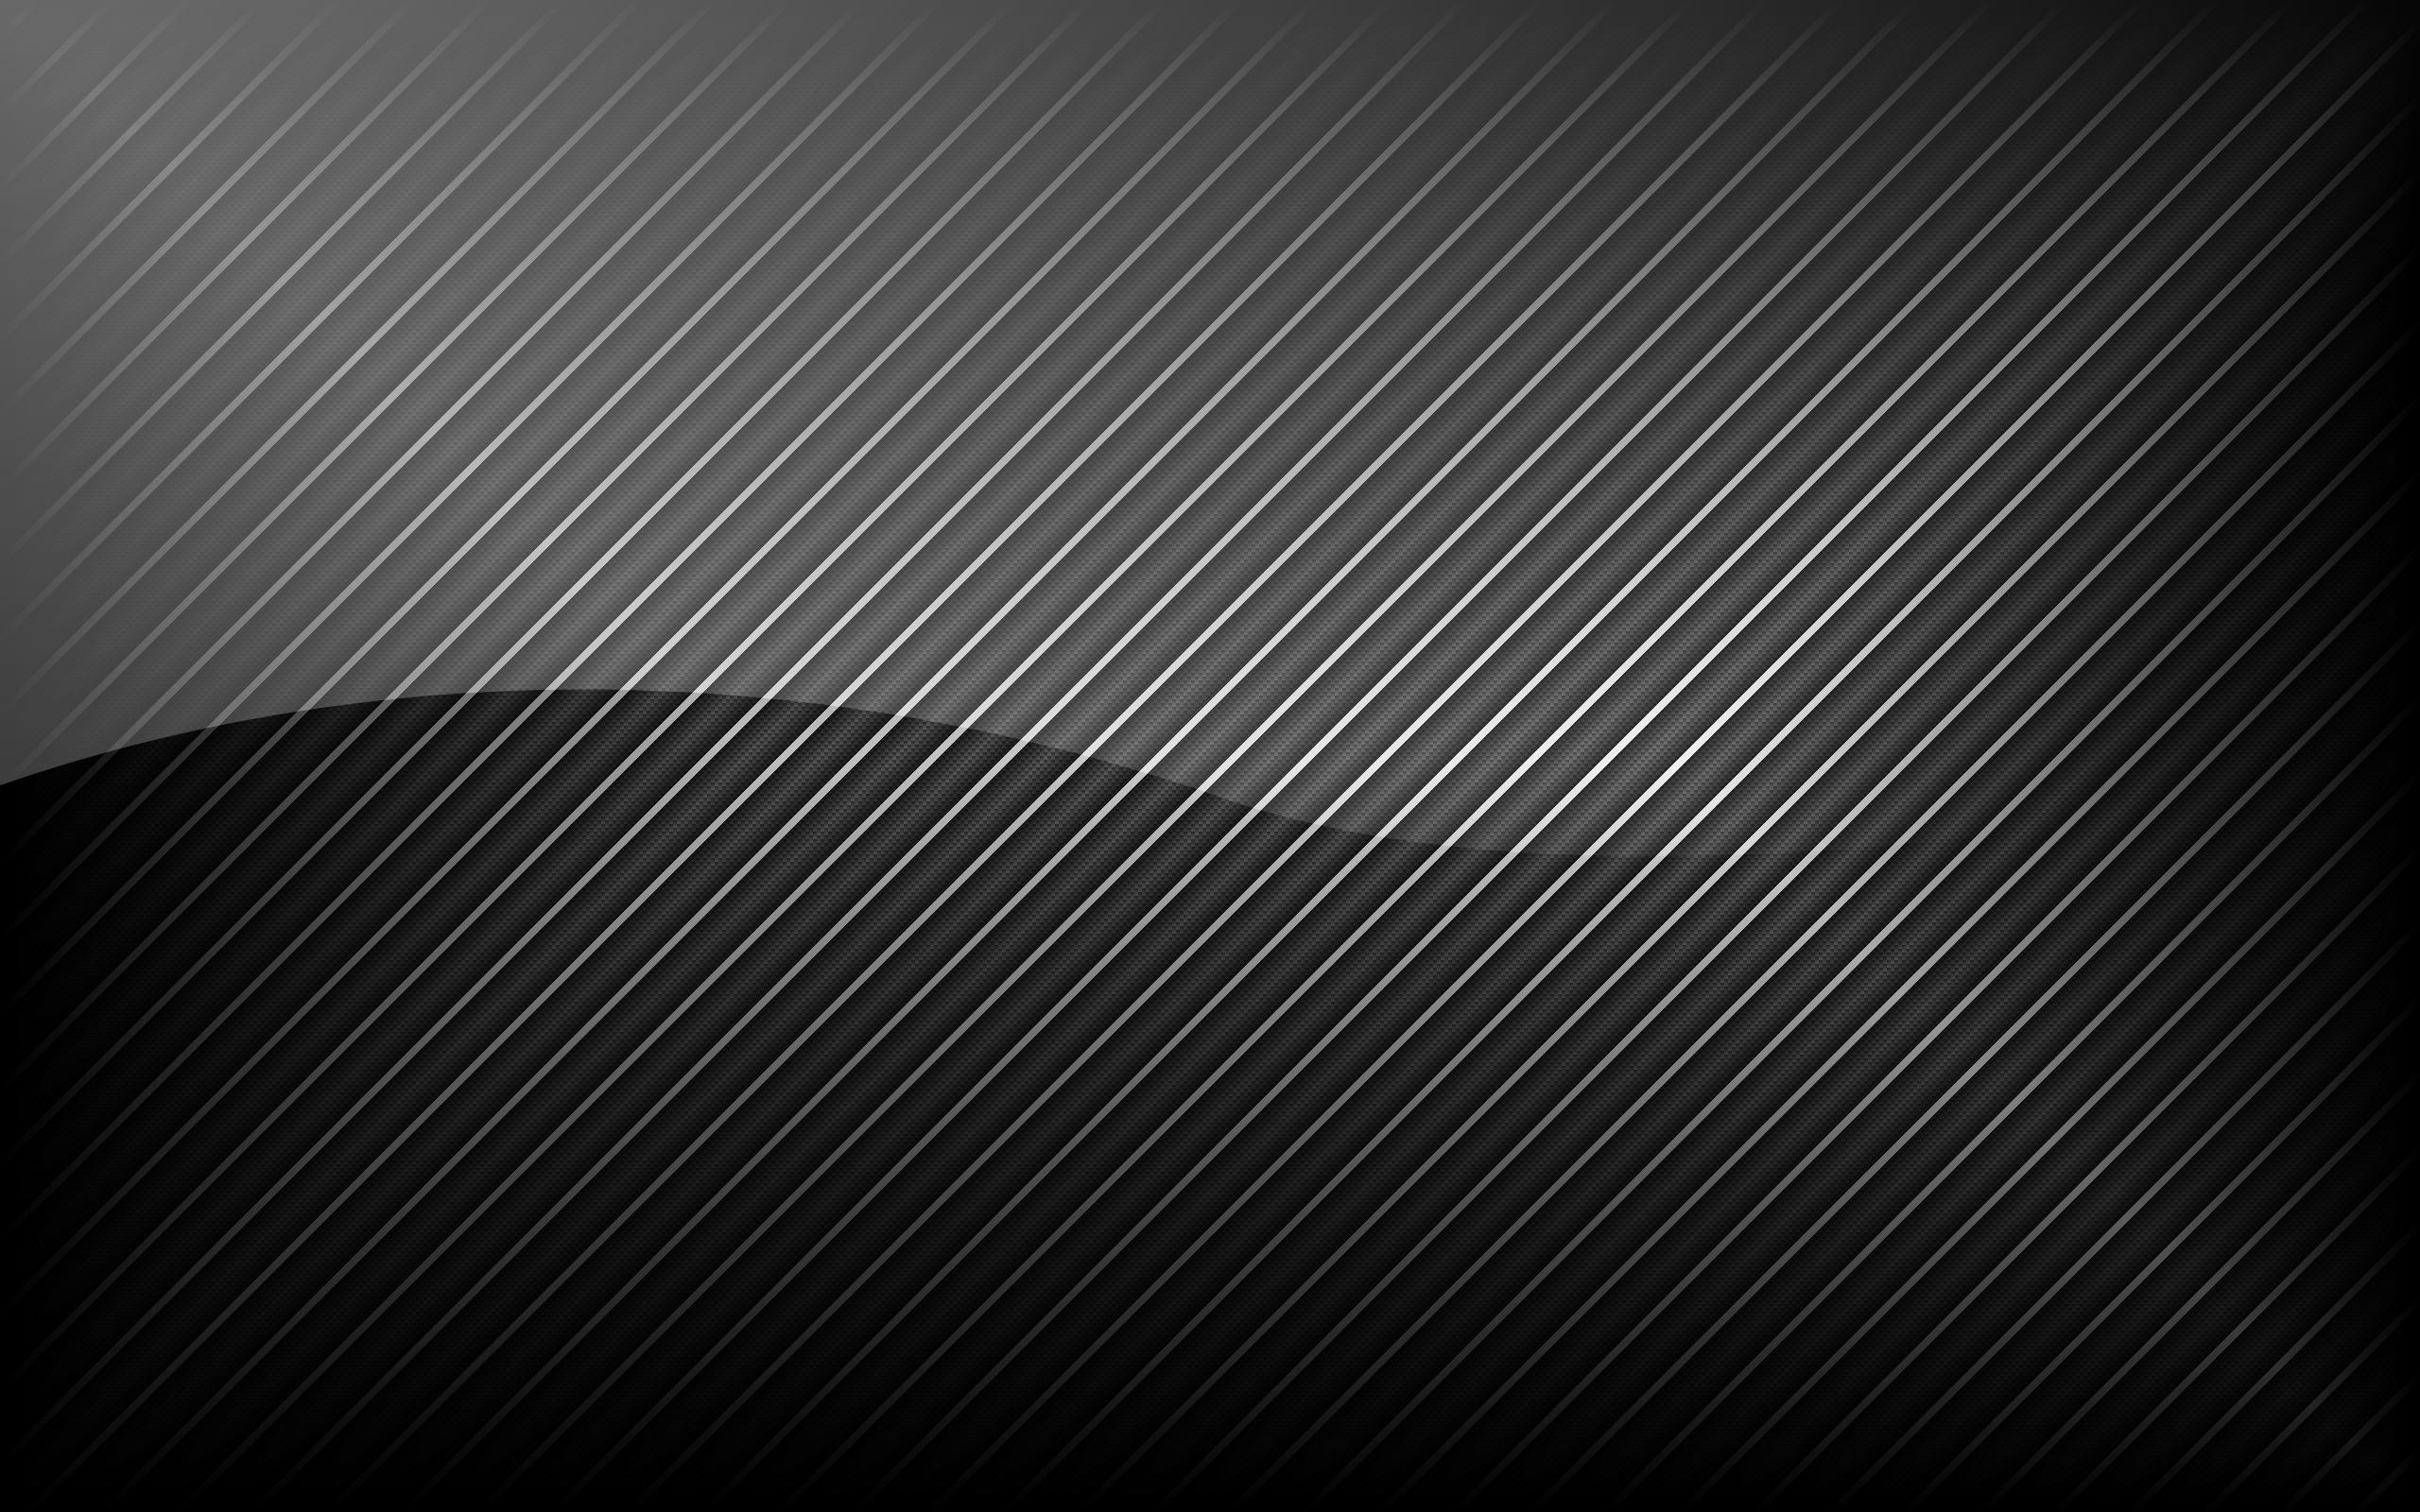 Iphone 6 carbon fiber wallpaper 76 images - Carbon wallpaper iphone ...